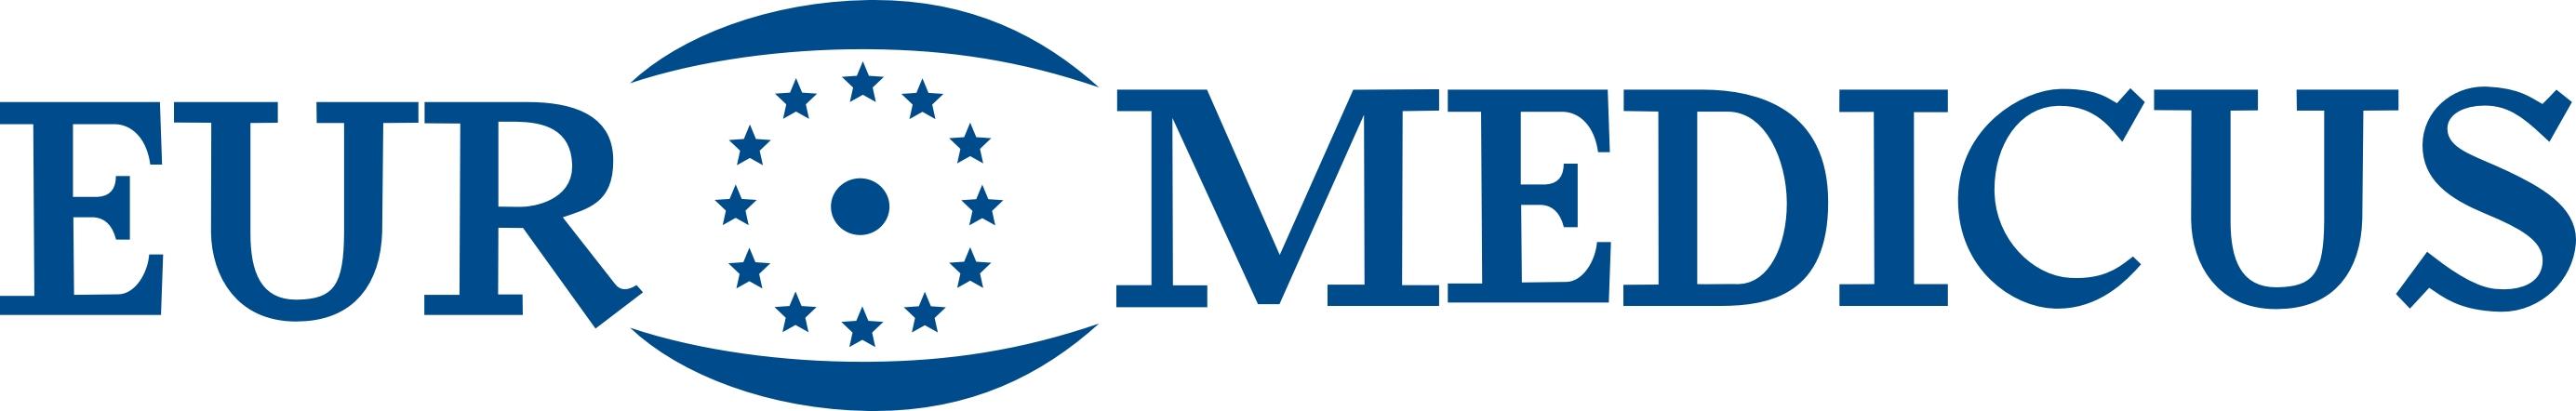 euromedicus_logo